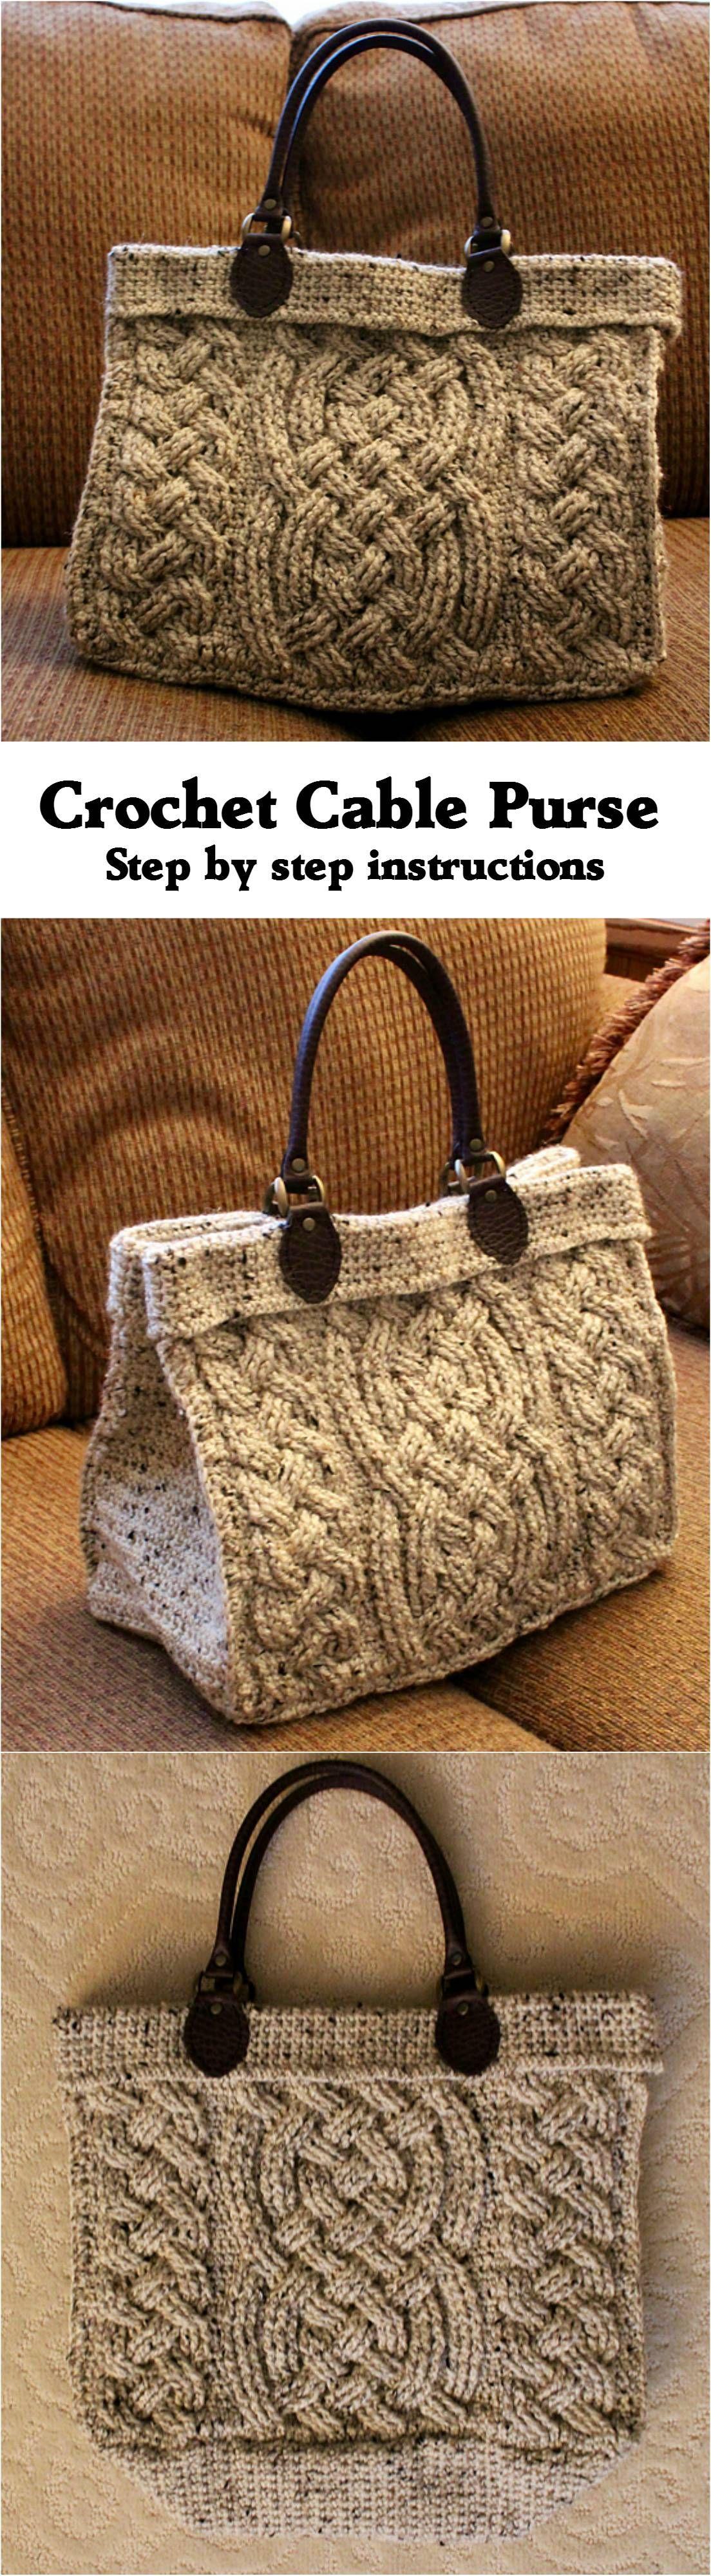 Crochet Cable Purse Crochet Pinterest Cable Handbag And Crochet # Web Muebles Jobe